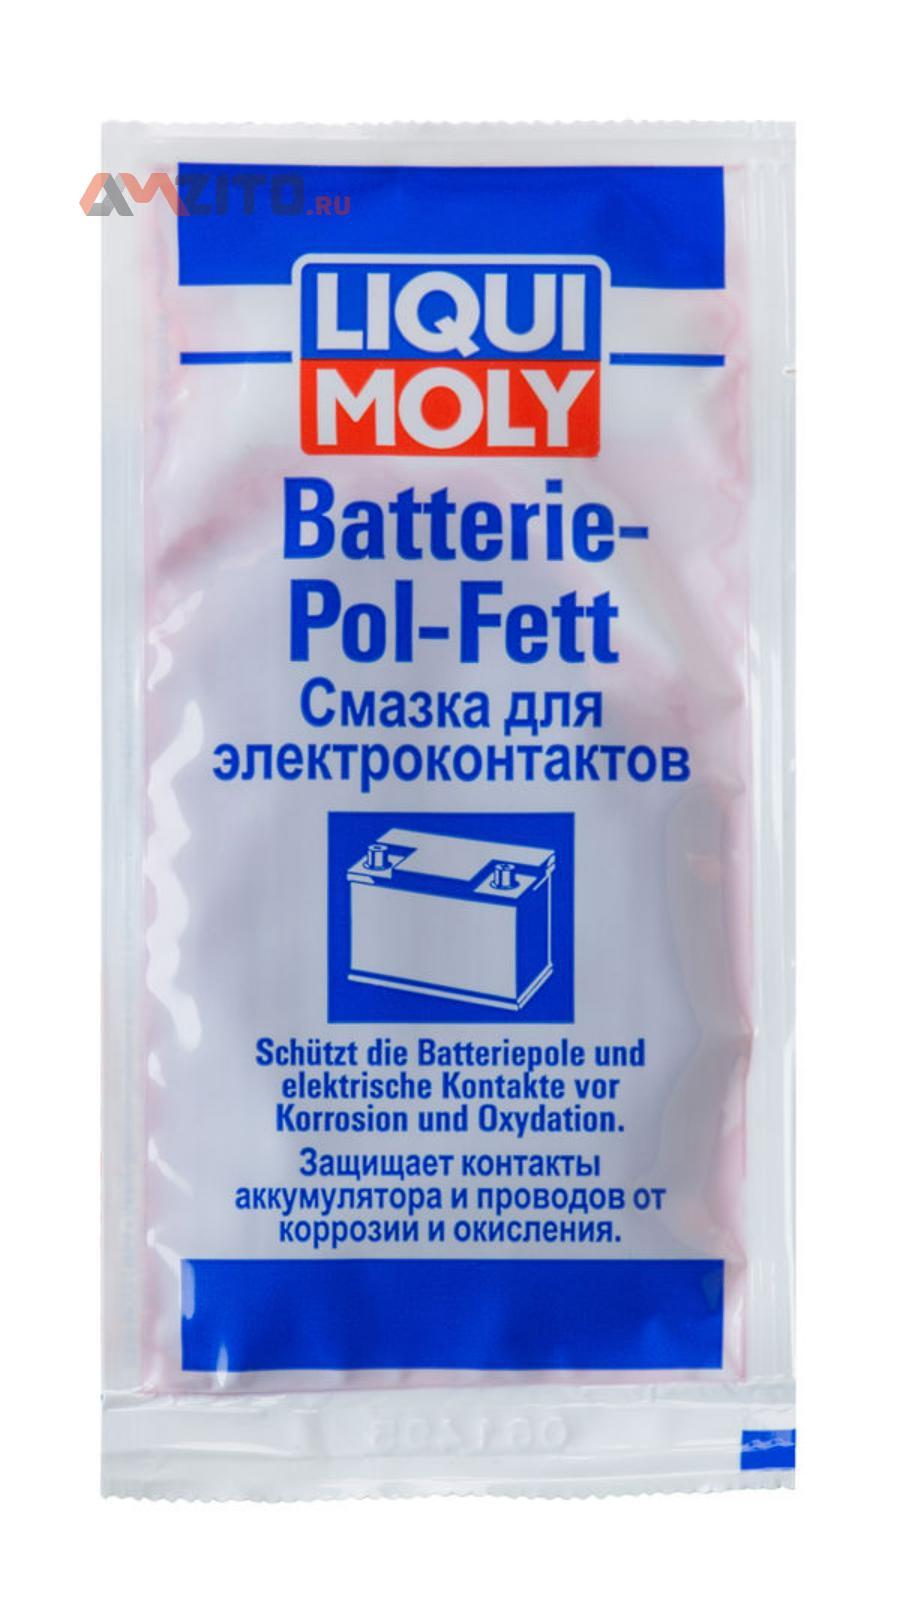 Смазка для электроконтактов LIQUI MOLY 0,01 л Batterie-Pol-Fett LIQUI MOLY 8045